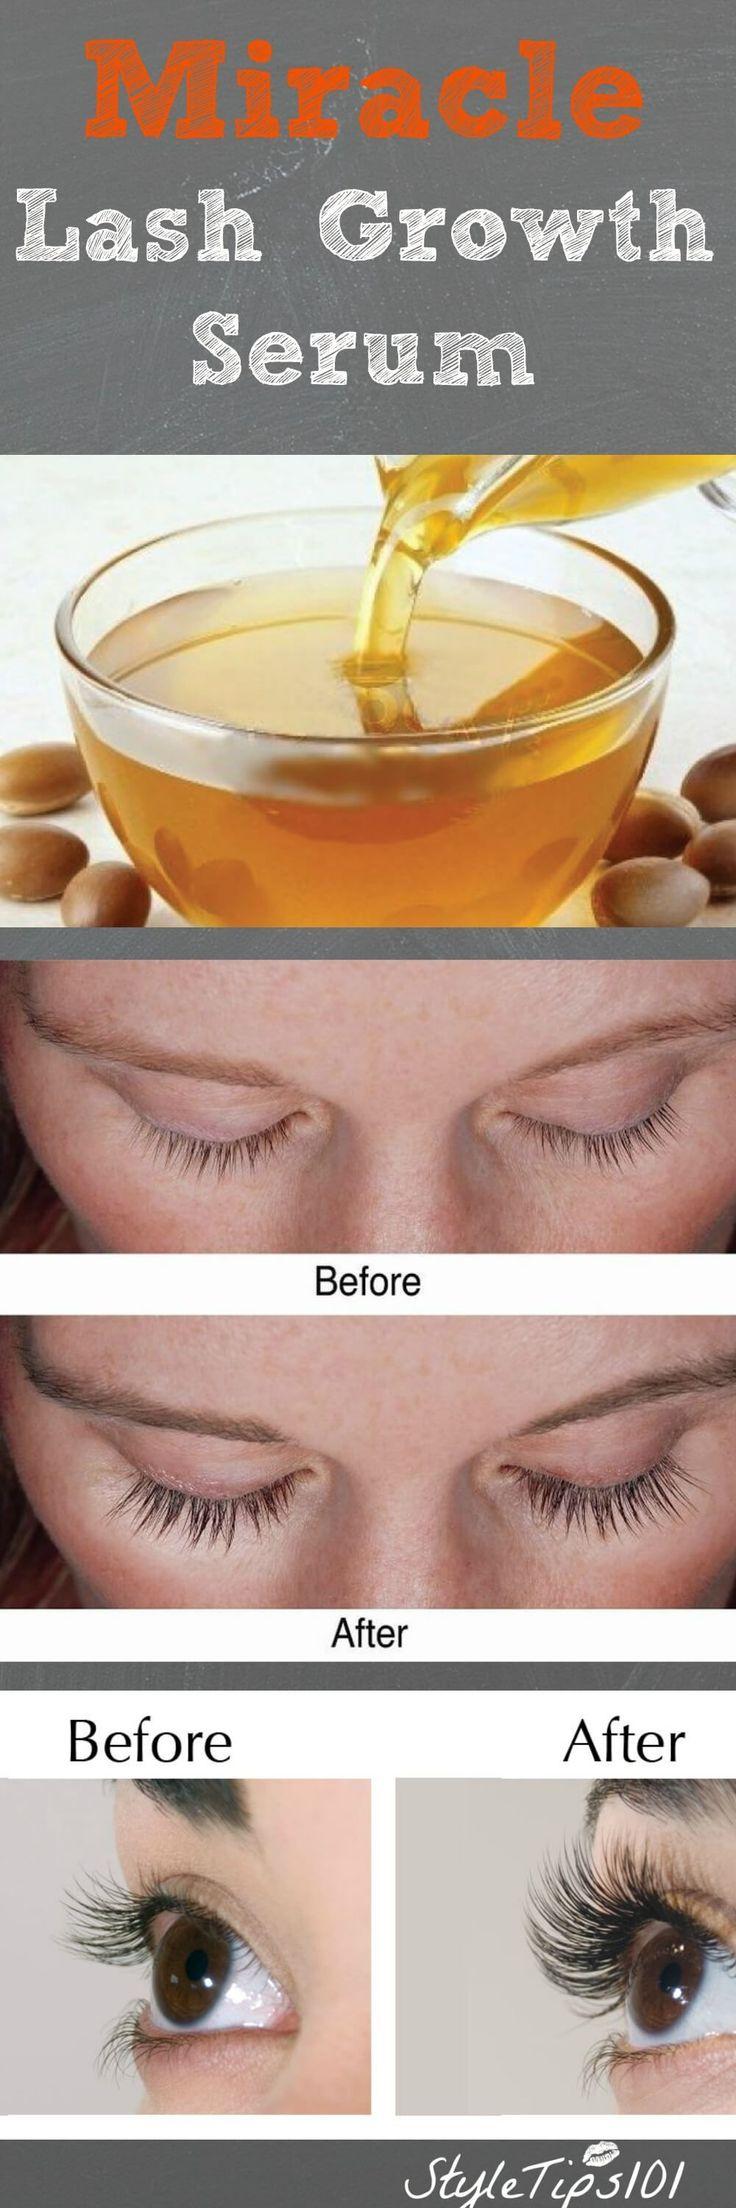 How to Grow Eyelashes - A Miracle DIY Serum